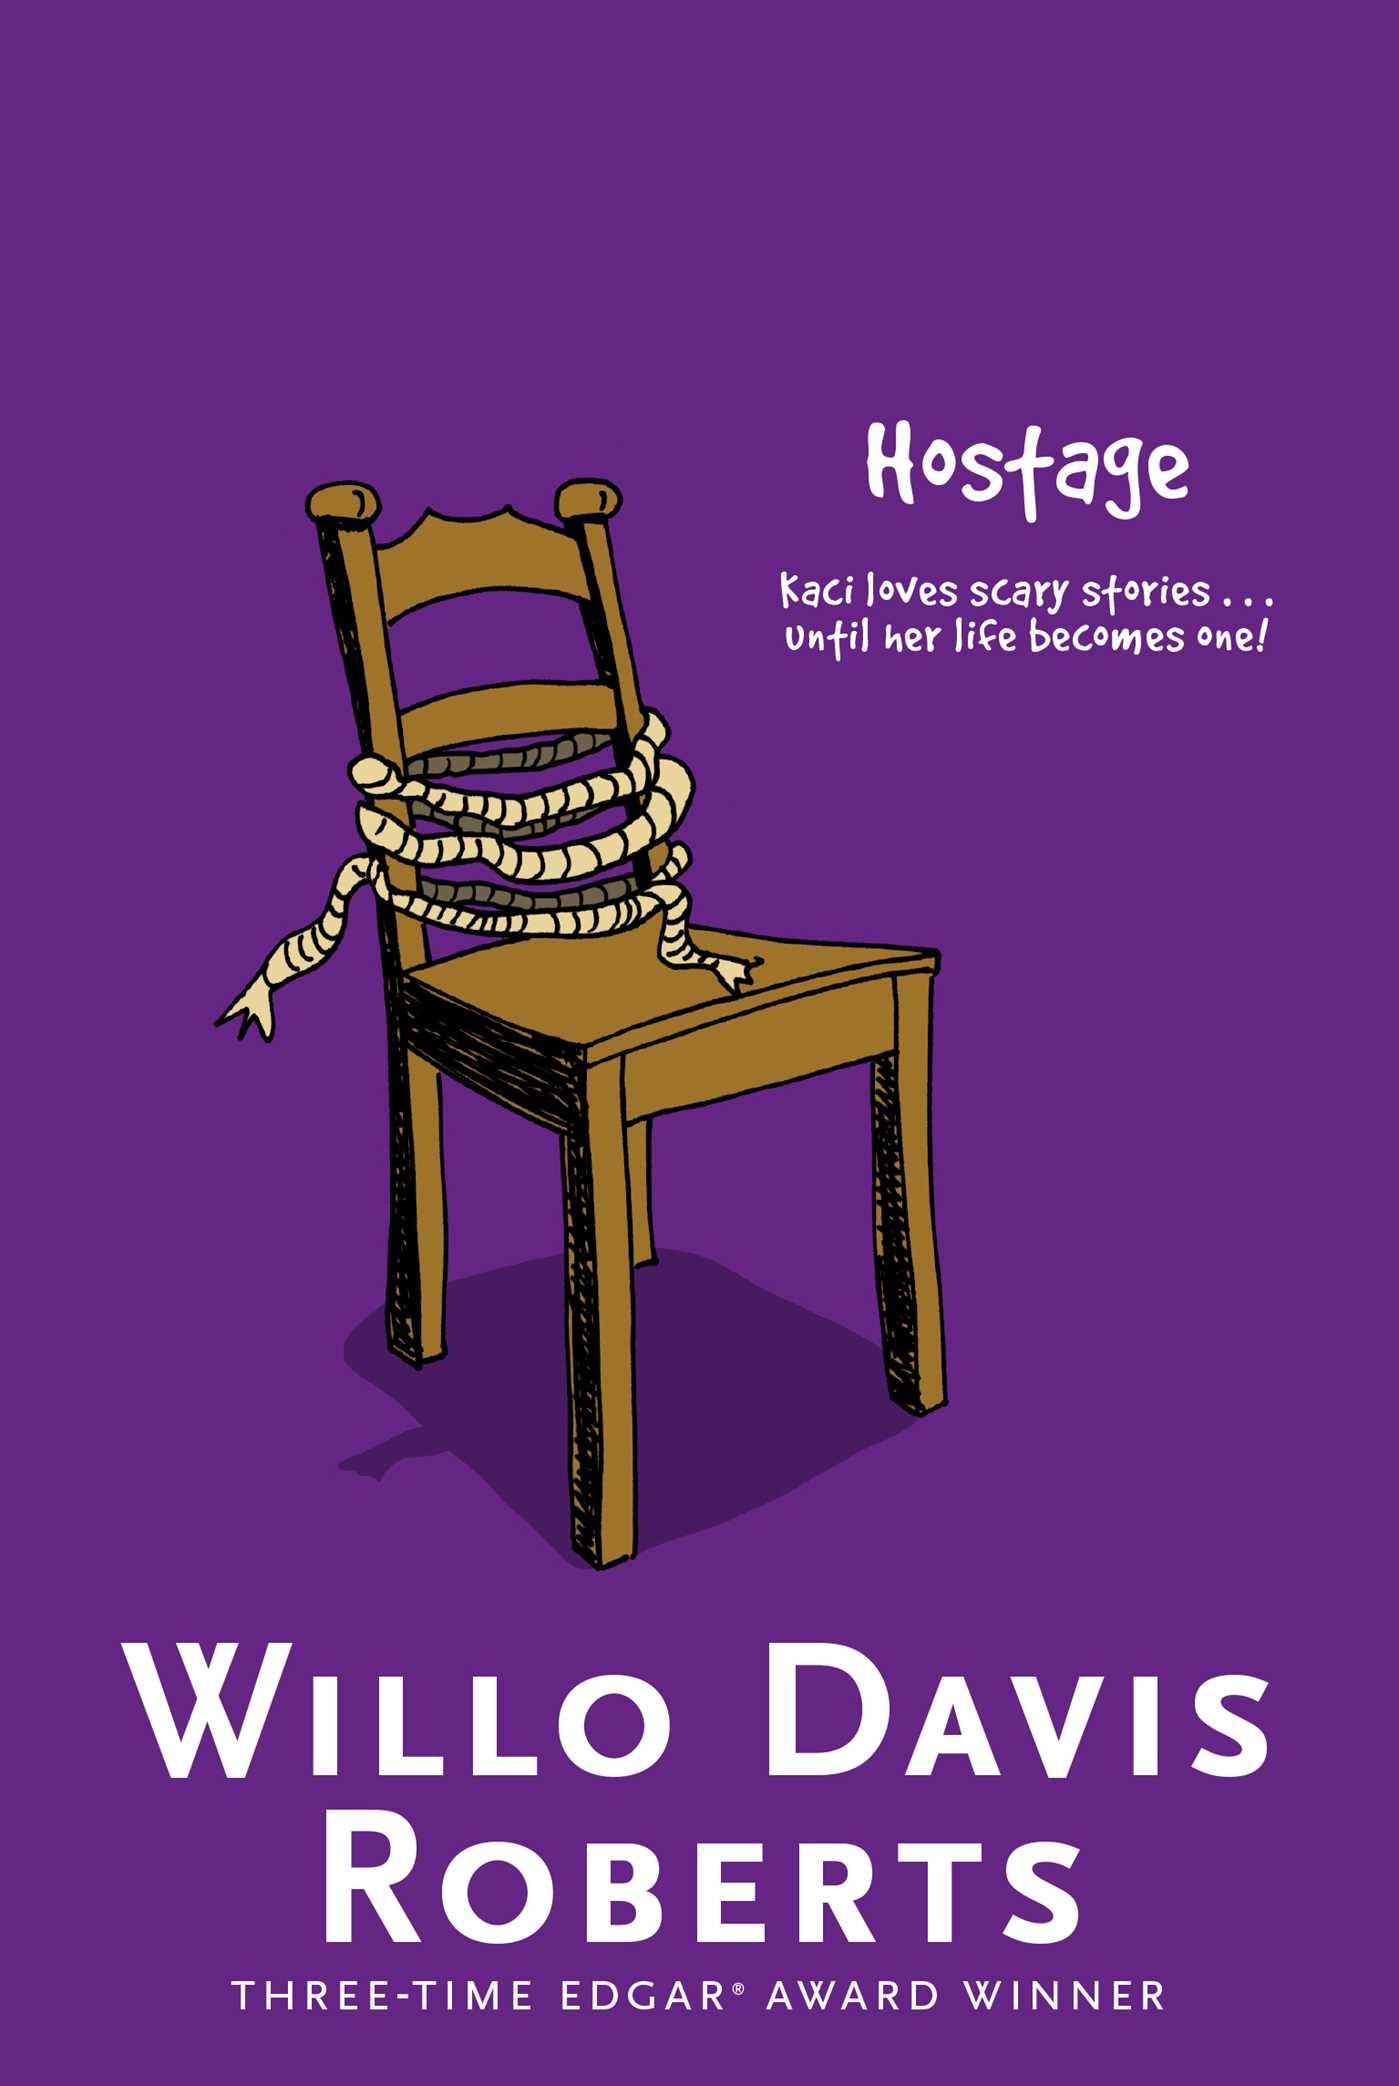 Hostage Book by Willo Davis Roberts